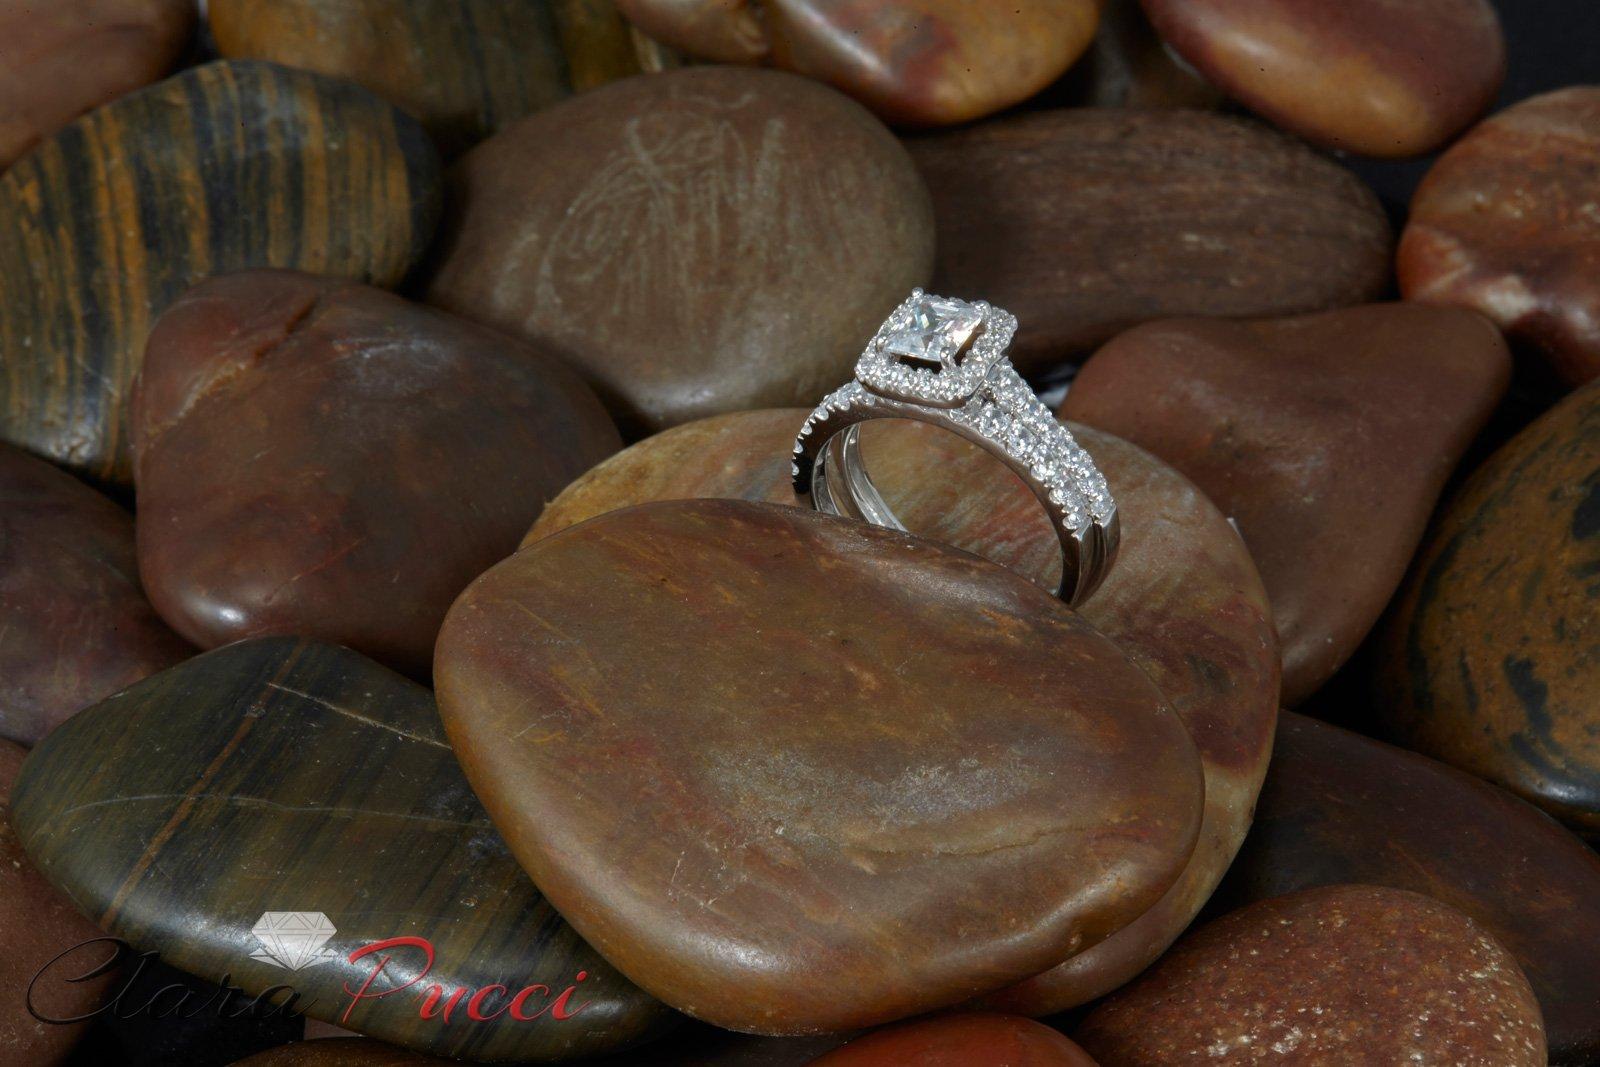 Clara Pucci 1.60 CT Princess Cut CZ Pave Halo Bridal Engagement Wedding Ring Band Set 14k White Gold, Size 8.5 by Clara Pucci (Image #3)